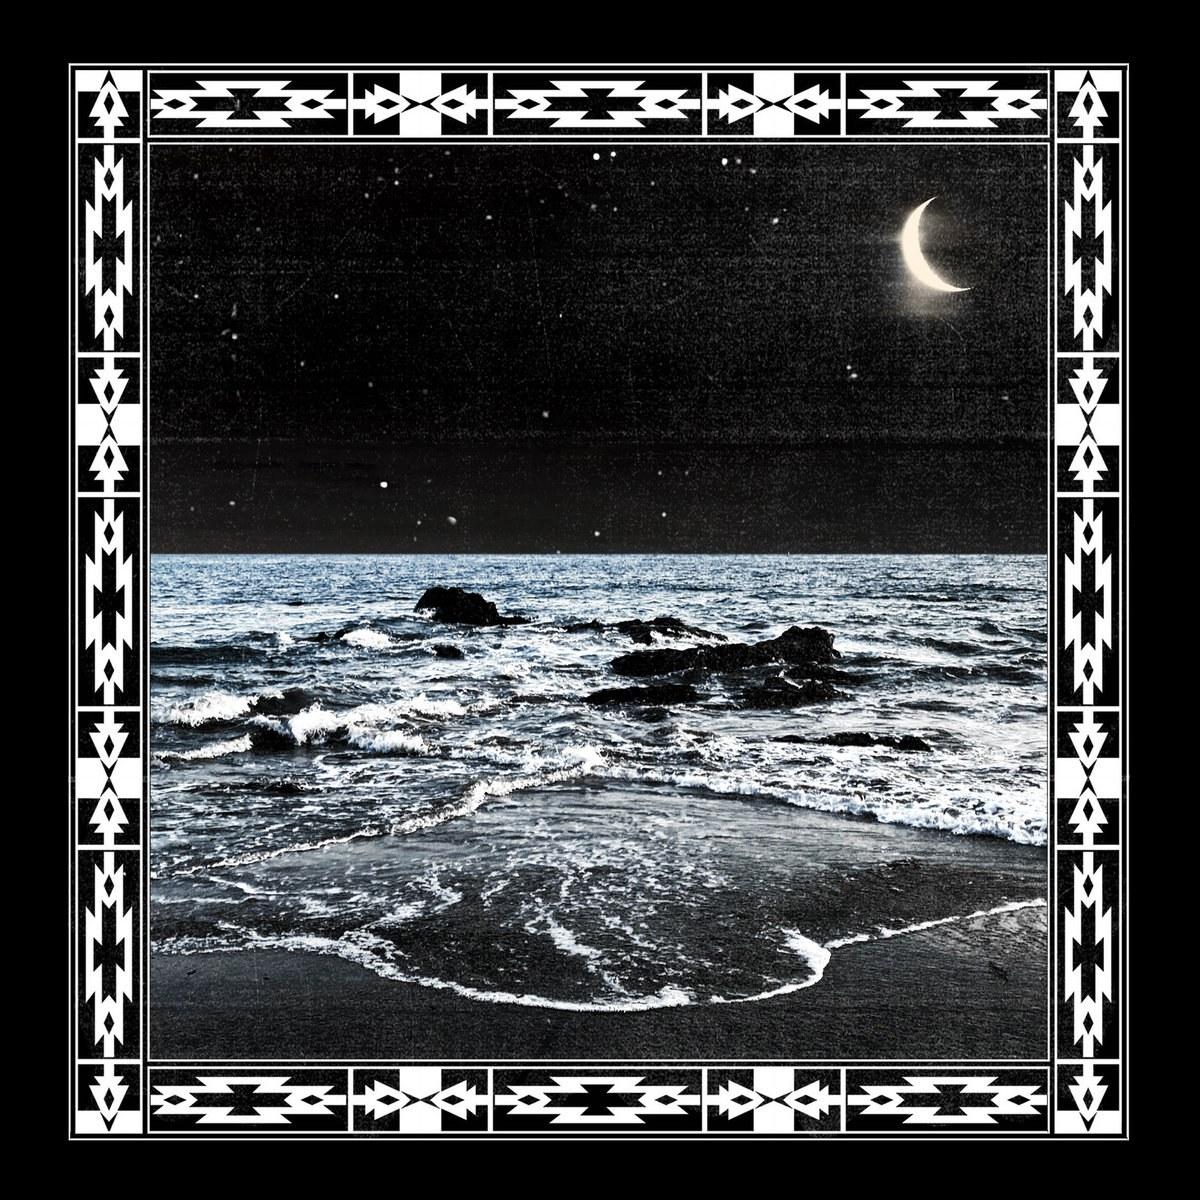 Lionoka - Tides of Triumph